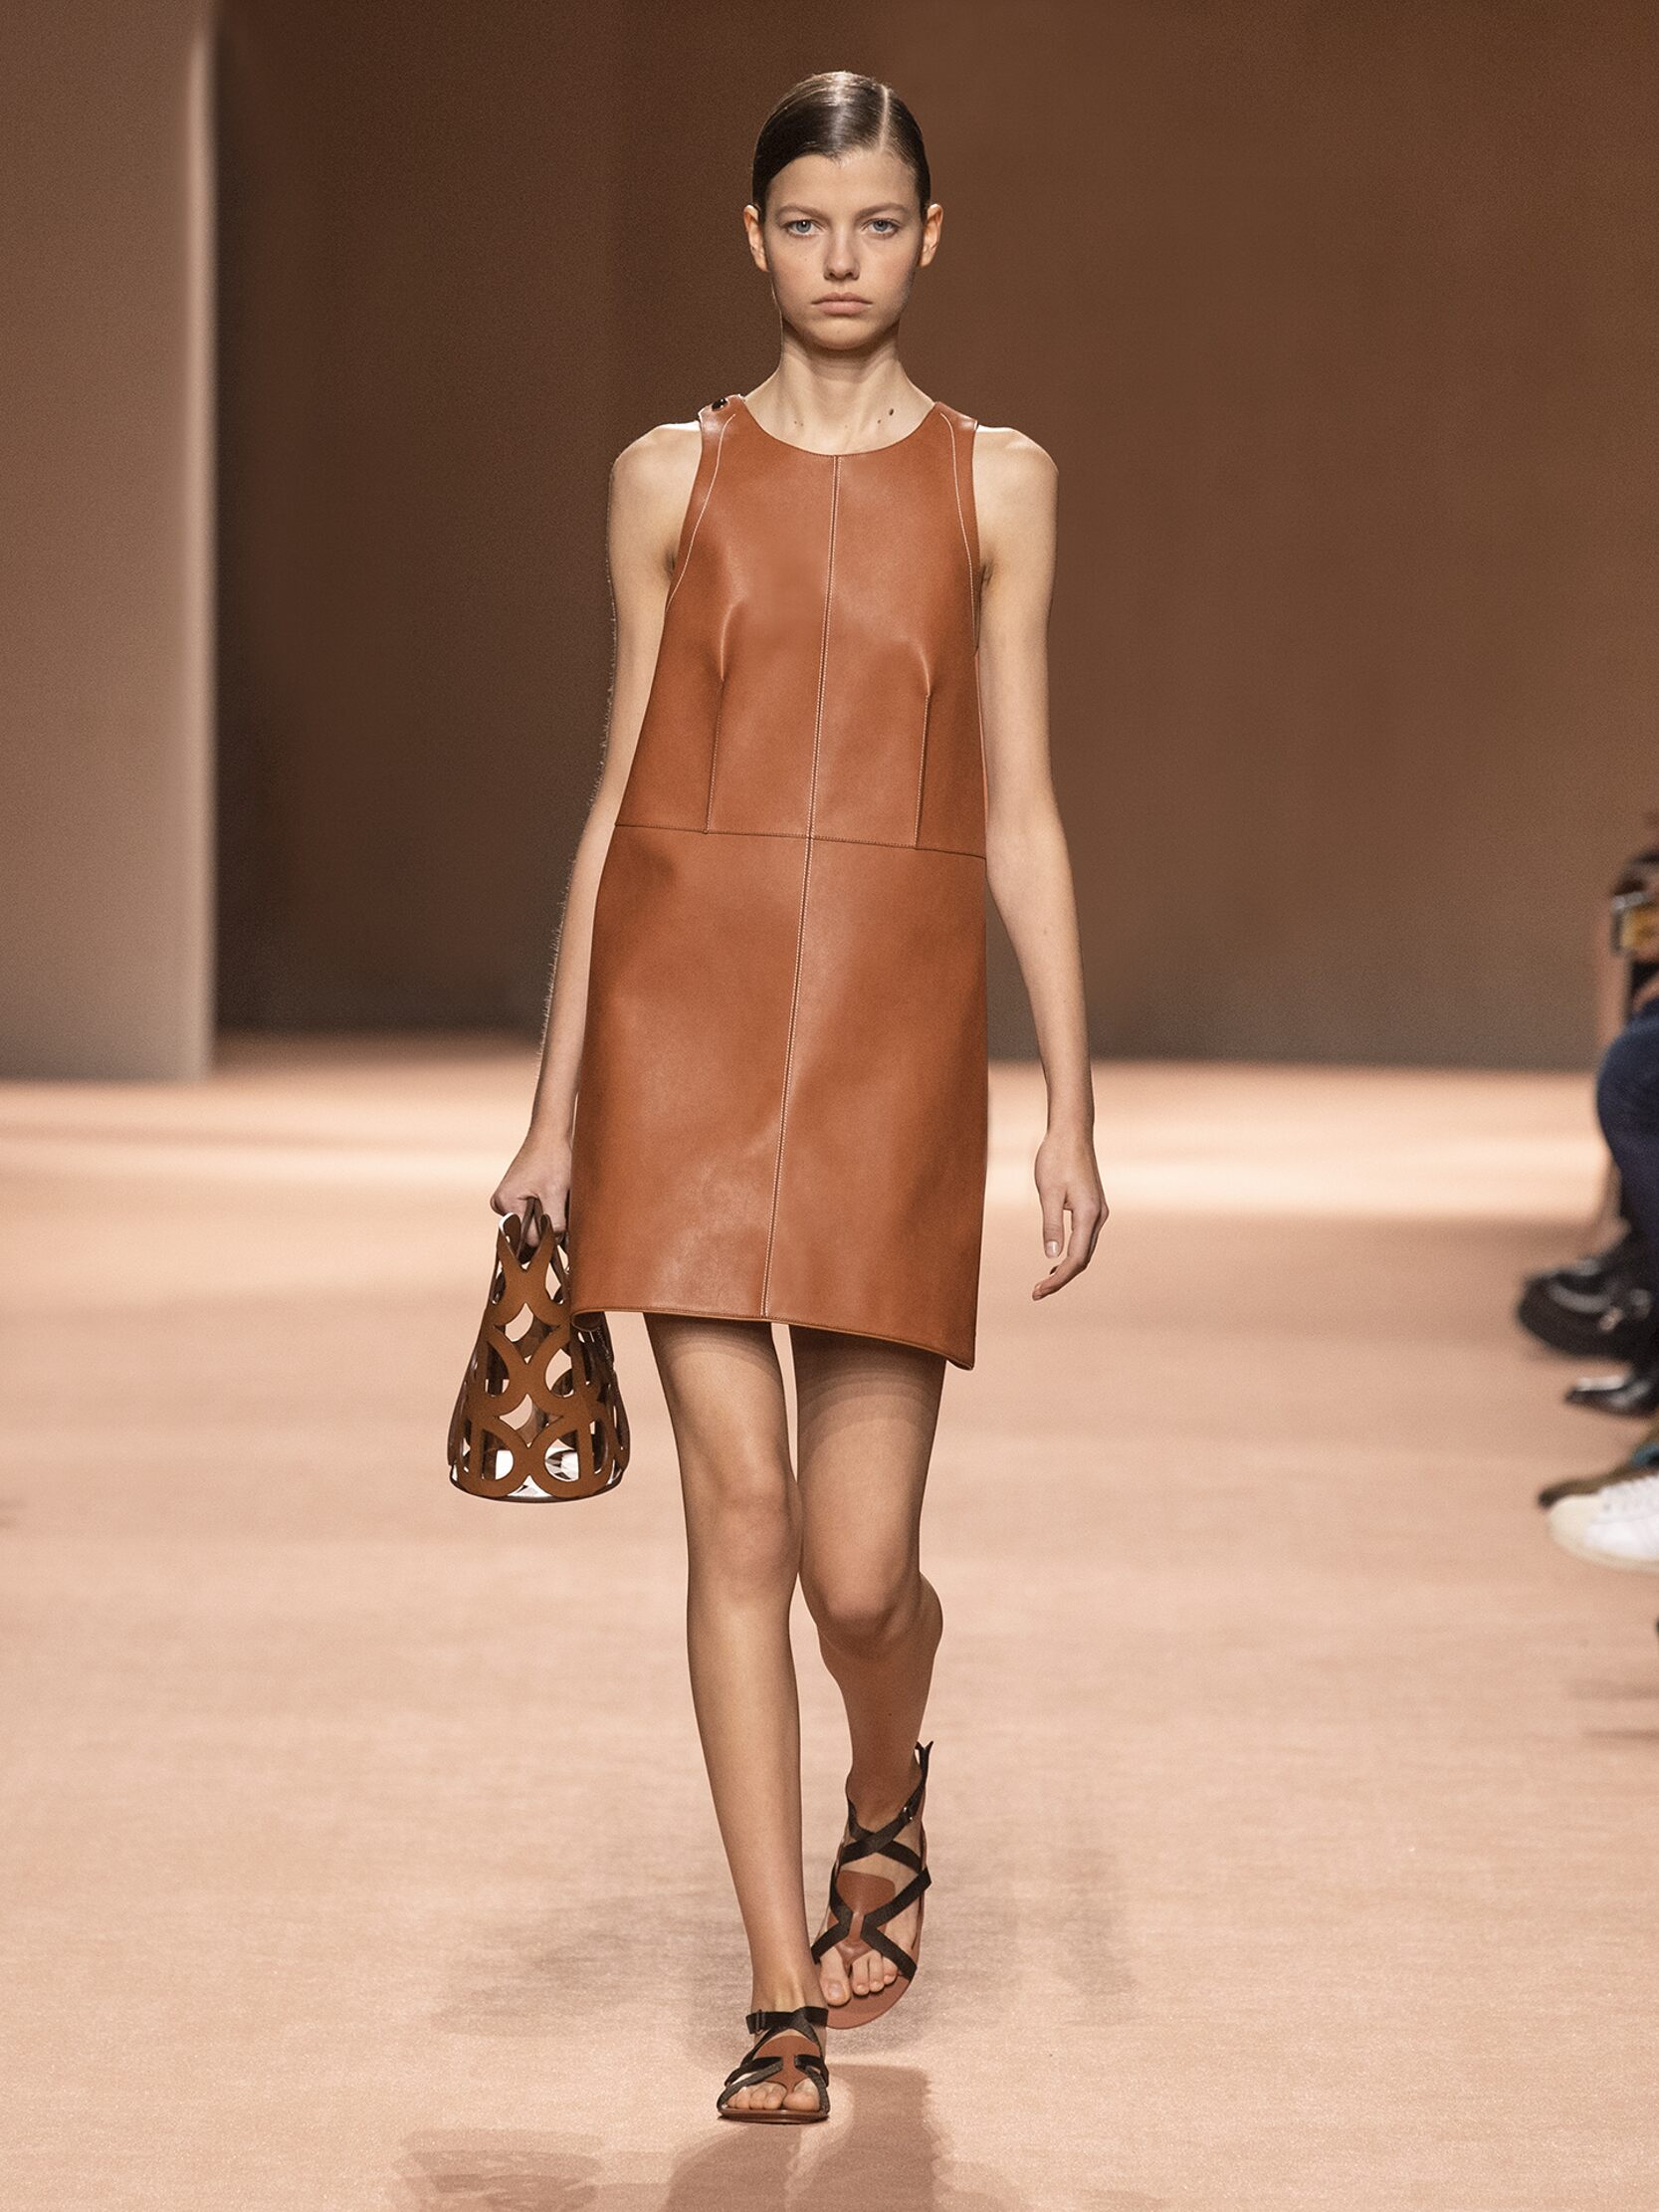 Hermès SS 2020 Womenswear